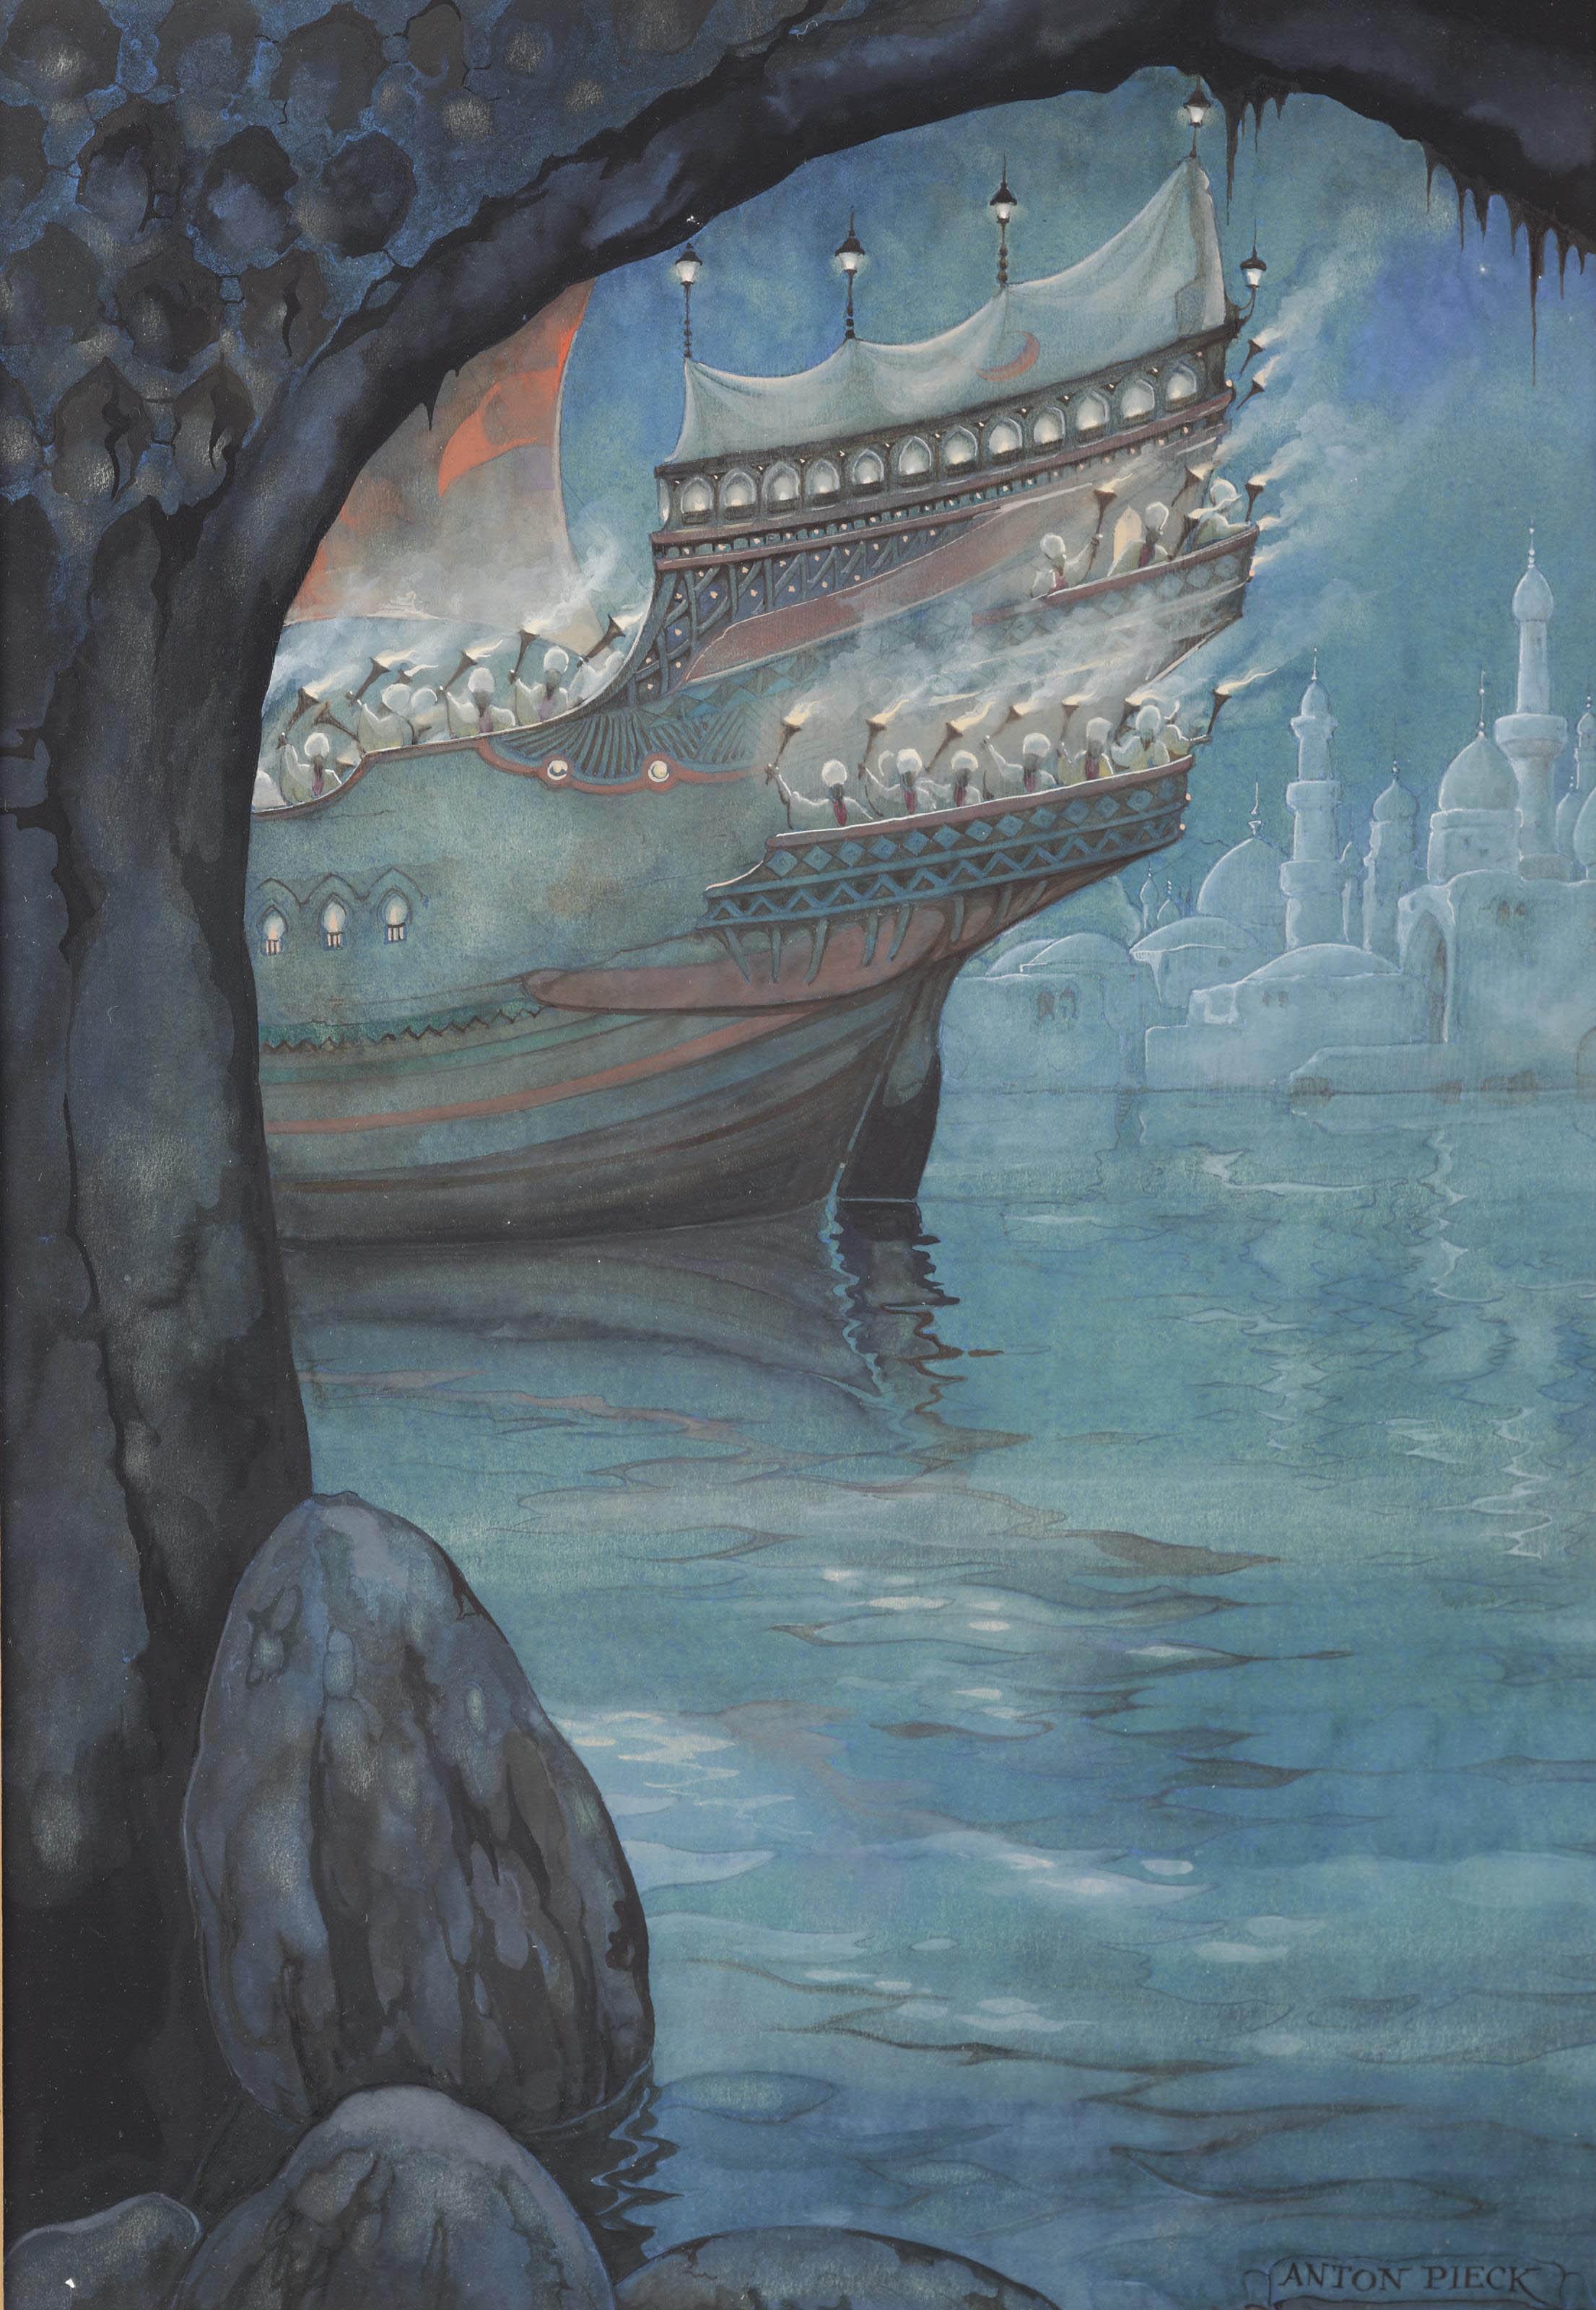 From 1001 Arabian nights; the story of The strange Khalif